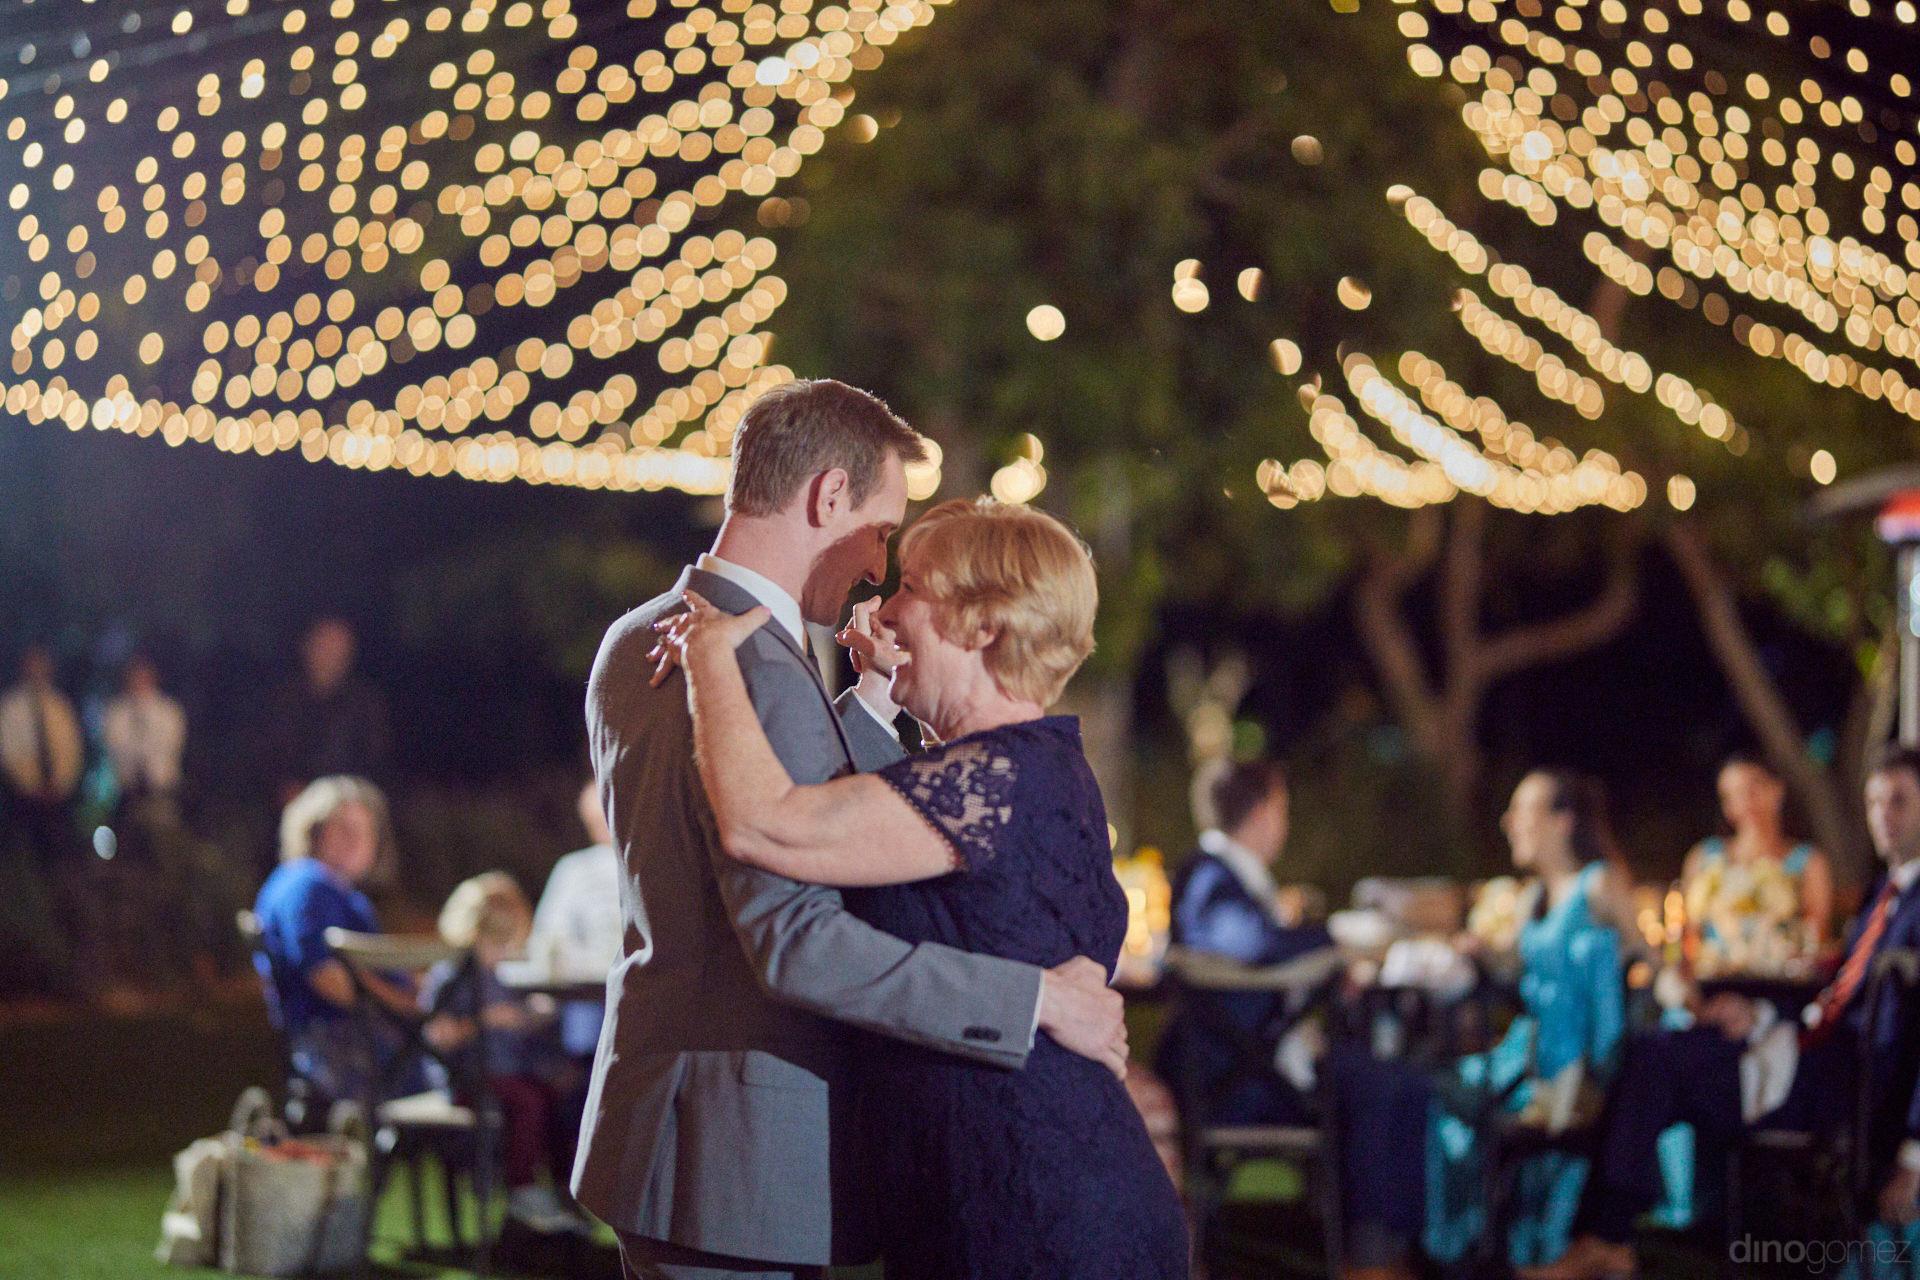 Wedding Photography Los Cabos Mexico - Hilary & Bryan Flora Wedding